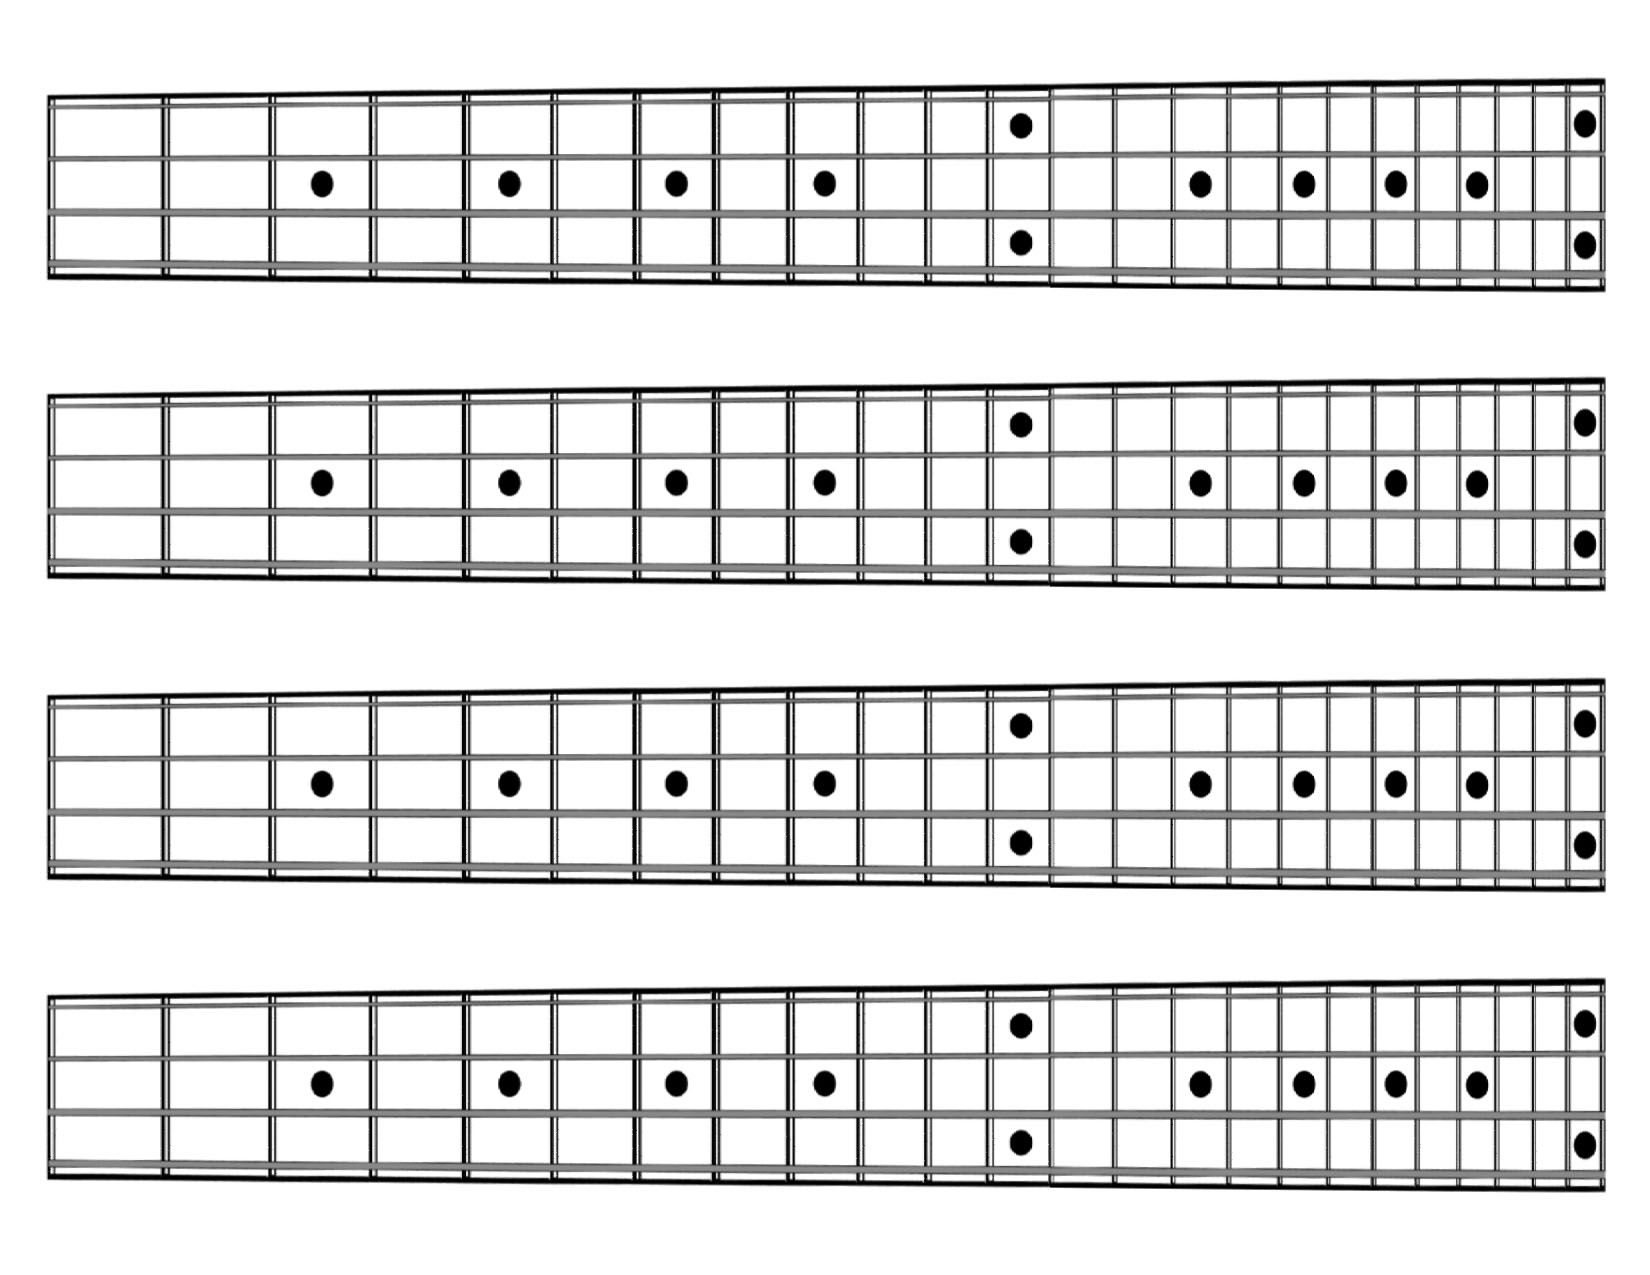 5 String Fretboard | MUSIC: Charts & Diagrams | Pinterest